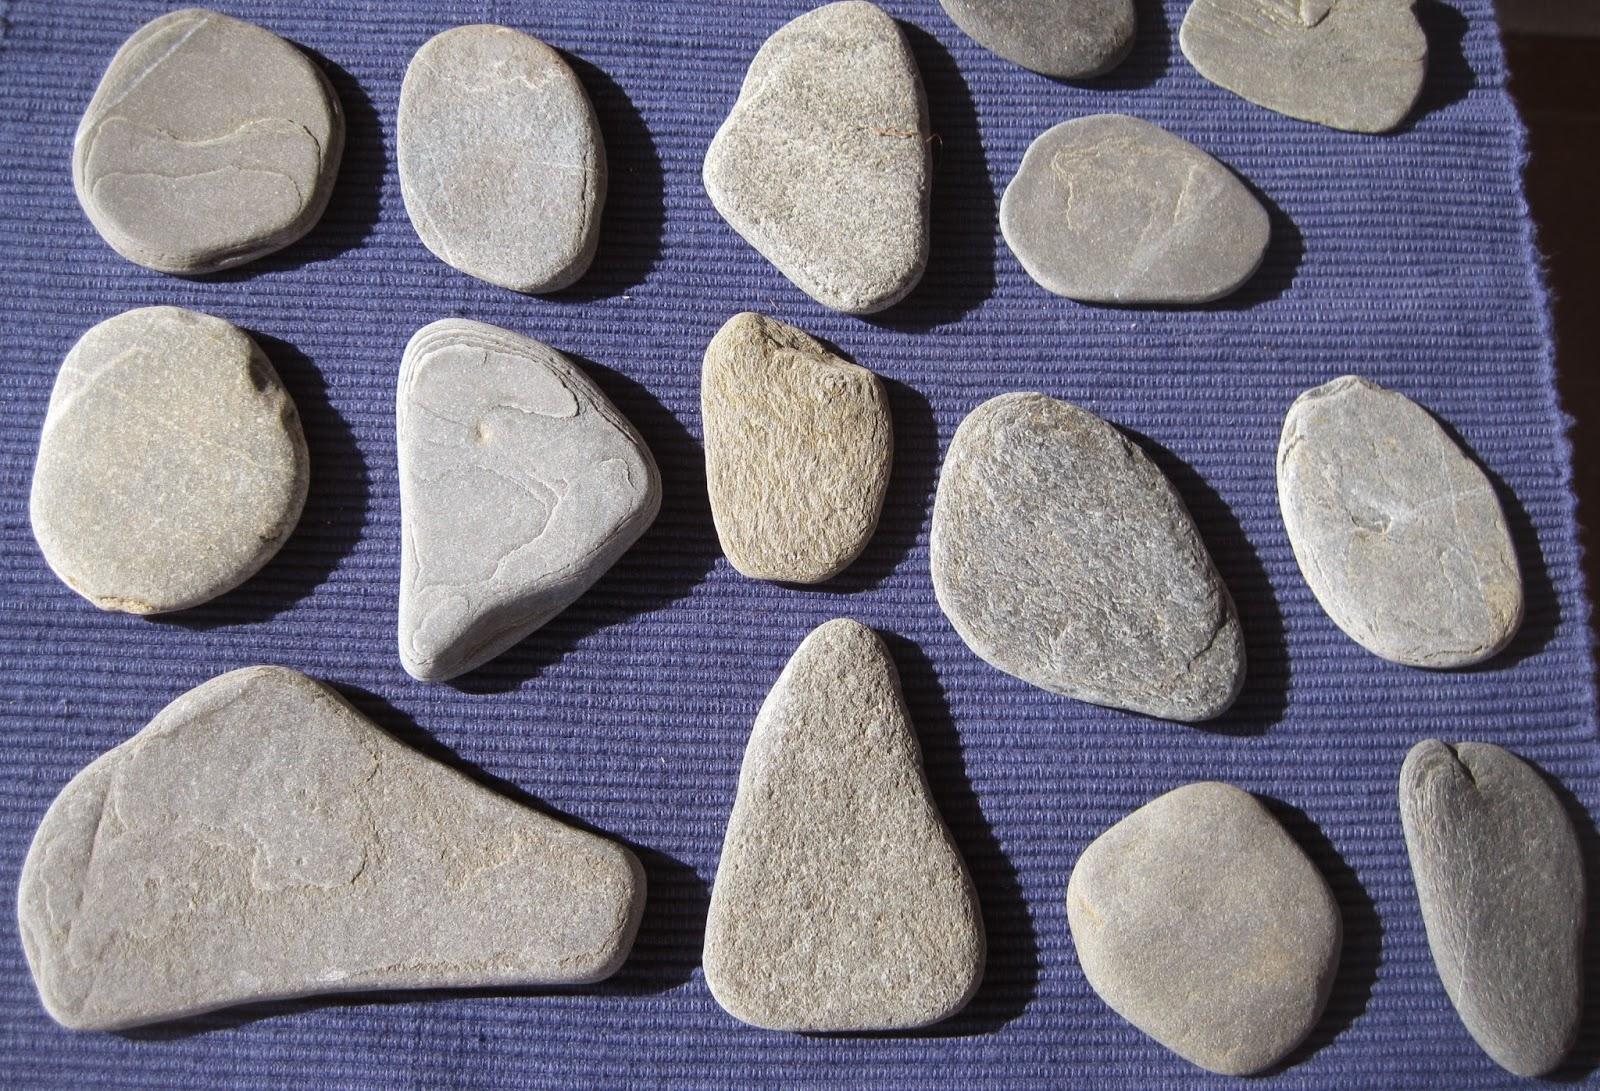 Piedras para decorar top piedras para decorar with piedras para decorar ideas para decorar con - Piedras para decorar ...